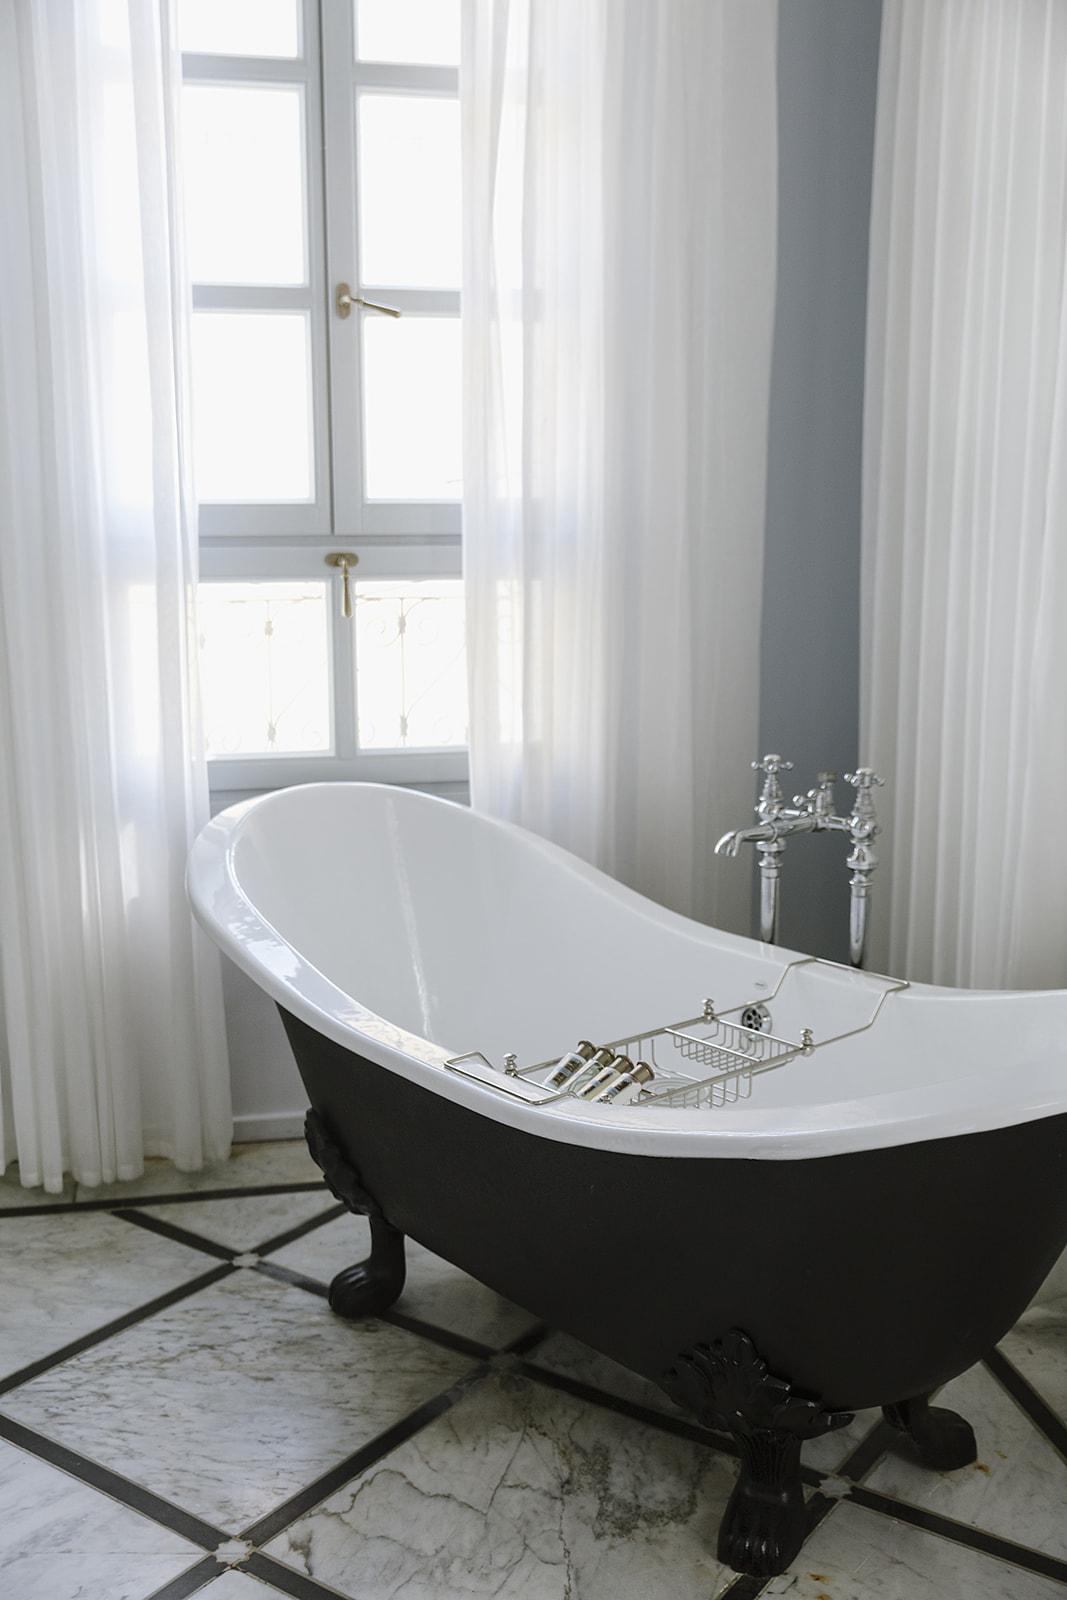 MakeEatMagazine_Travel_Best_Akko_hotels_Efendi_03